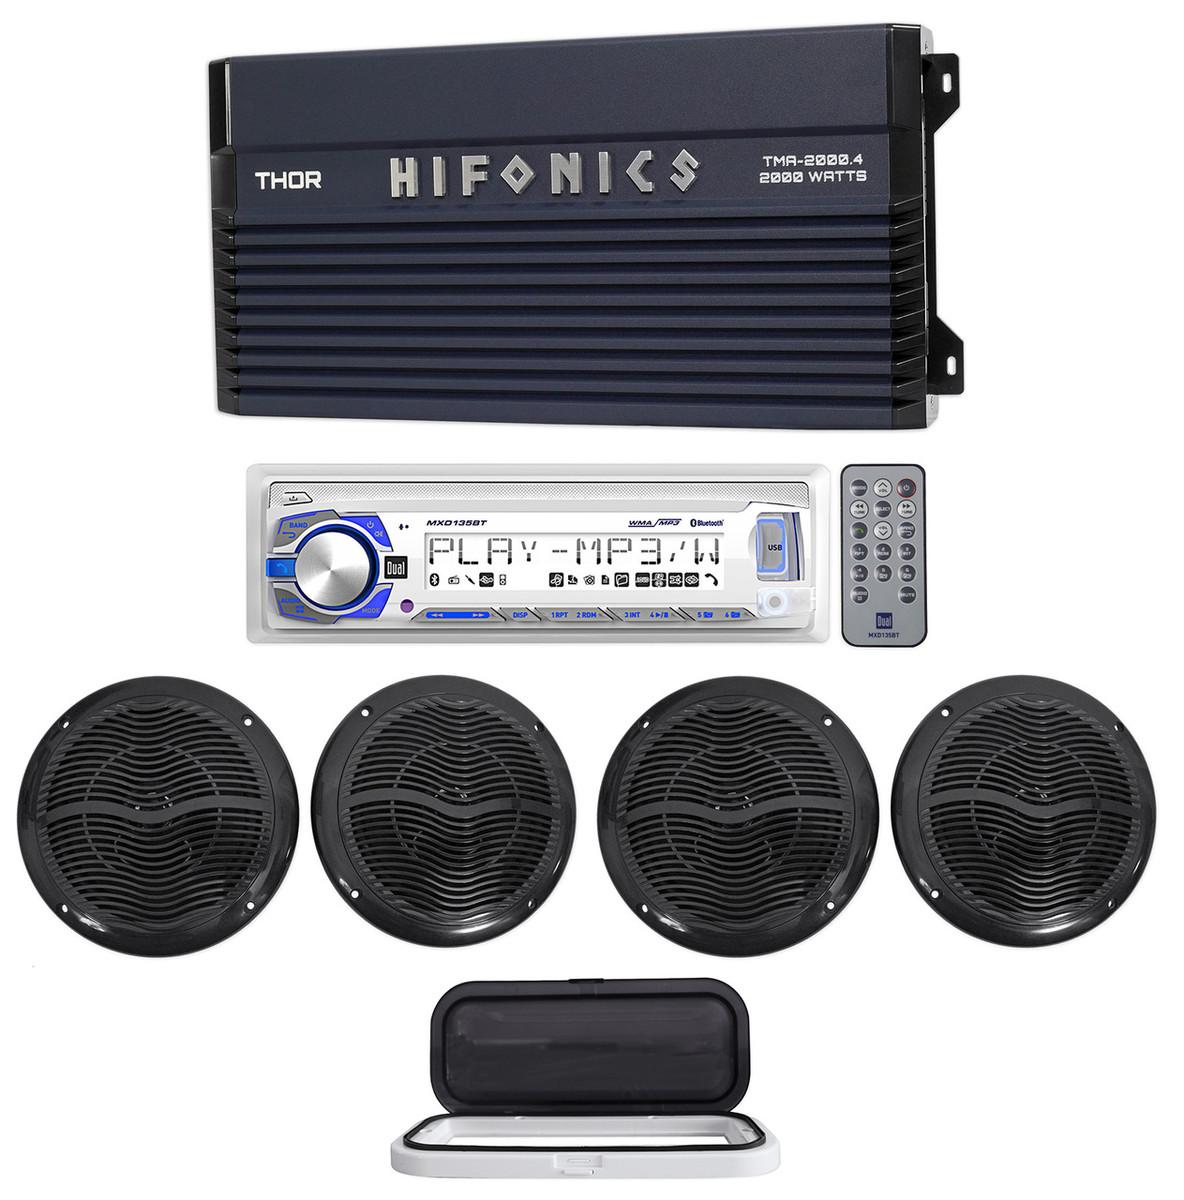 Hifonics TMA-2000 4 2000w 4-Ch Marine Boat Amplifier+Receiver+(4) 6 5